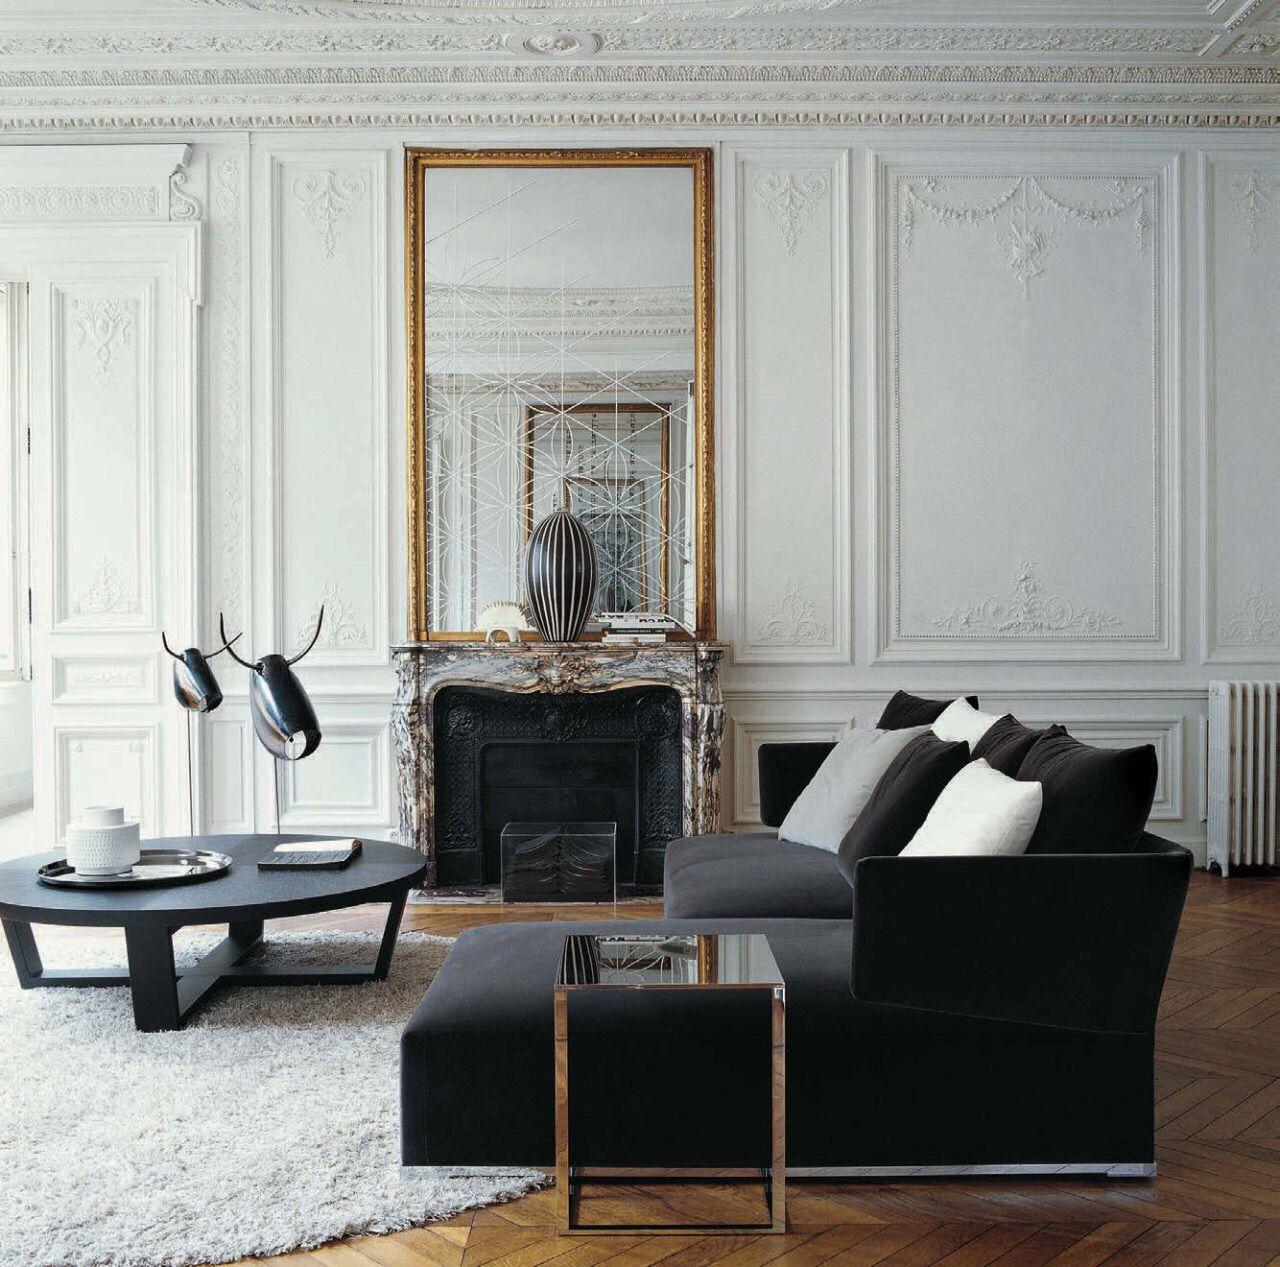 Cheap Outside Apartment: Pin By Pekka Törrönen On Modern Interiors